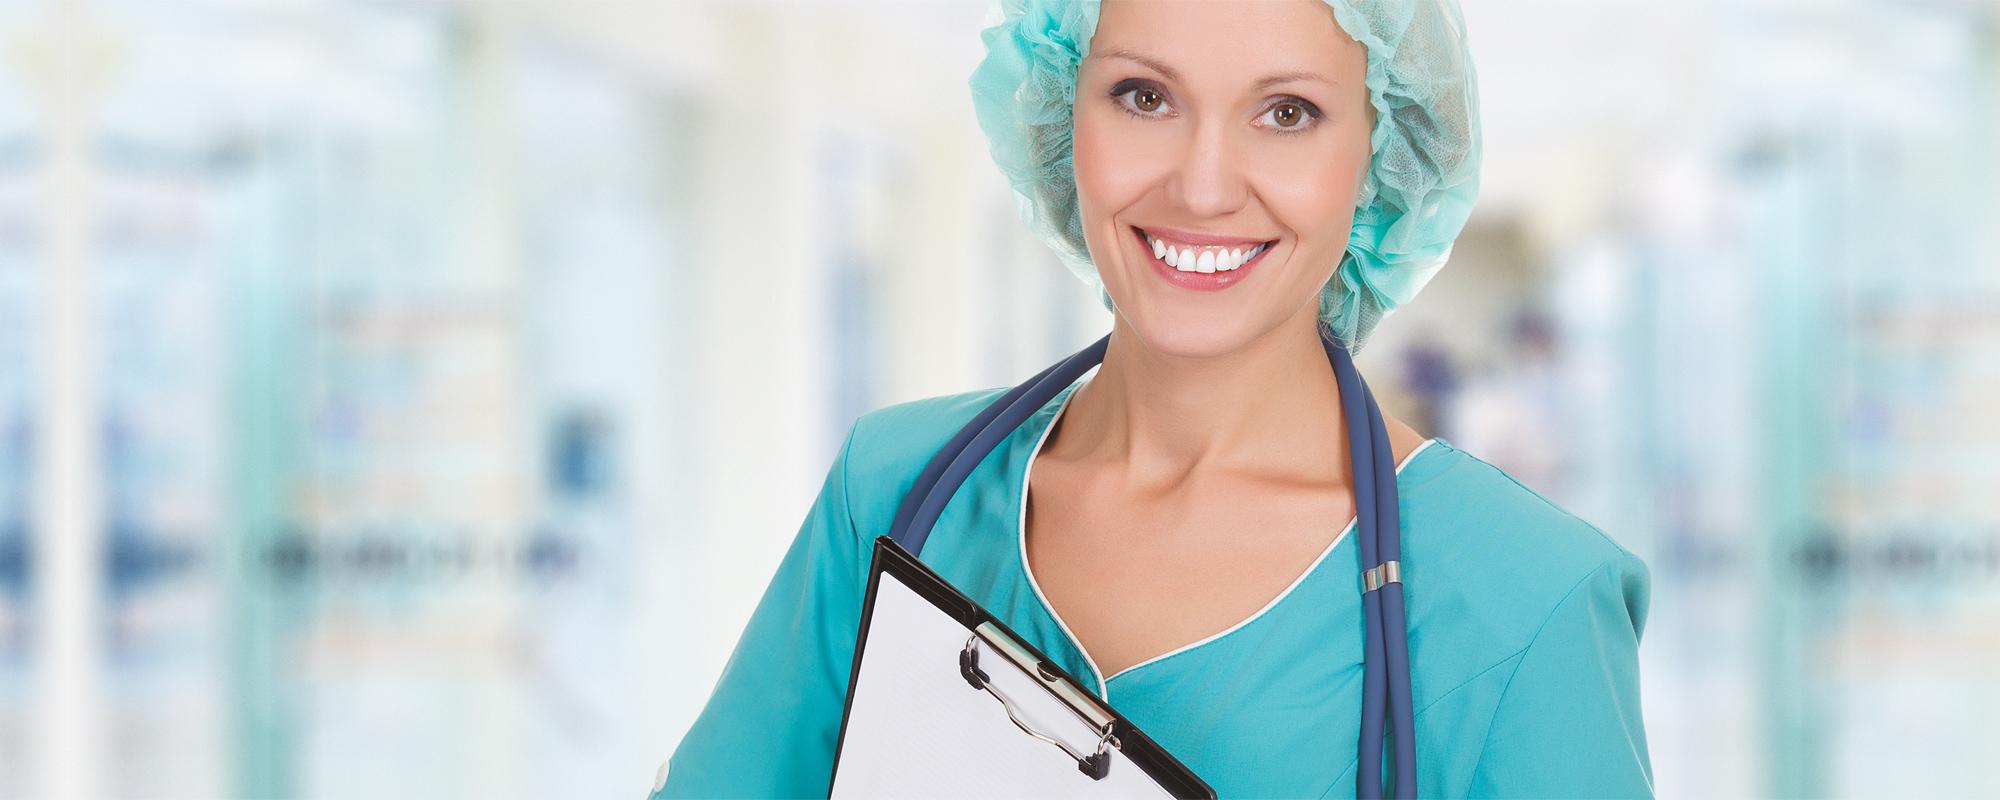 Odontoiatria <span>all'avanguardia</span>